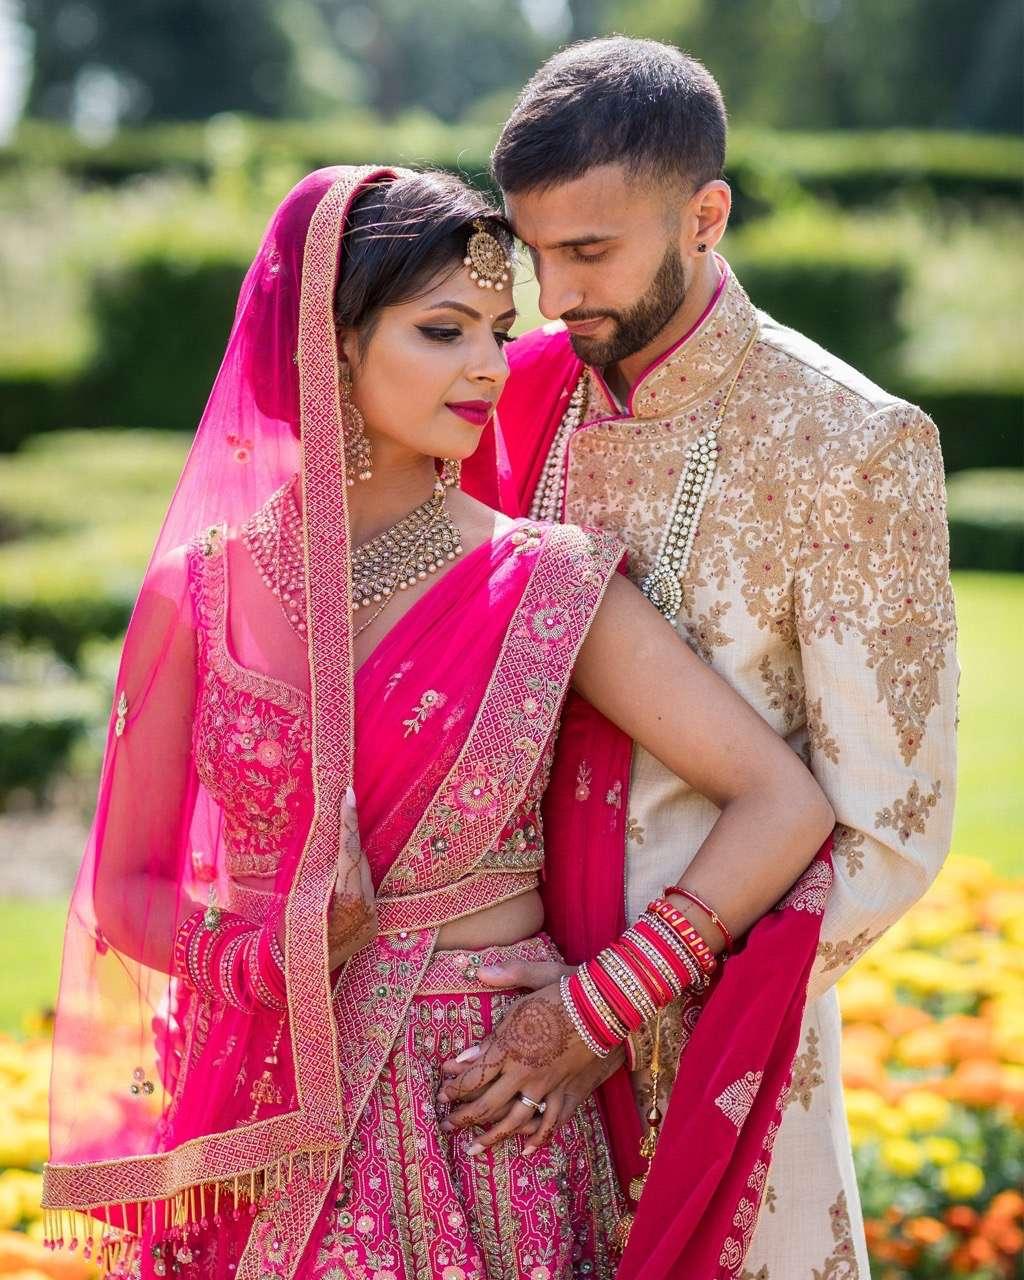 Rakhee real bridof kalki found her wedding dress on Instagram!